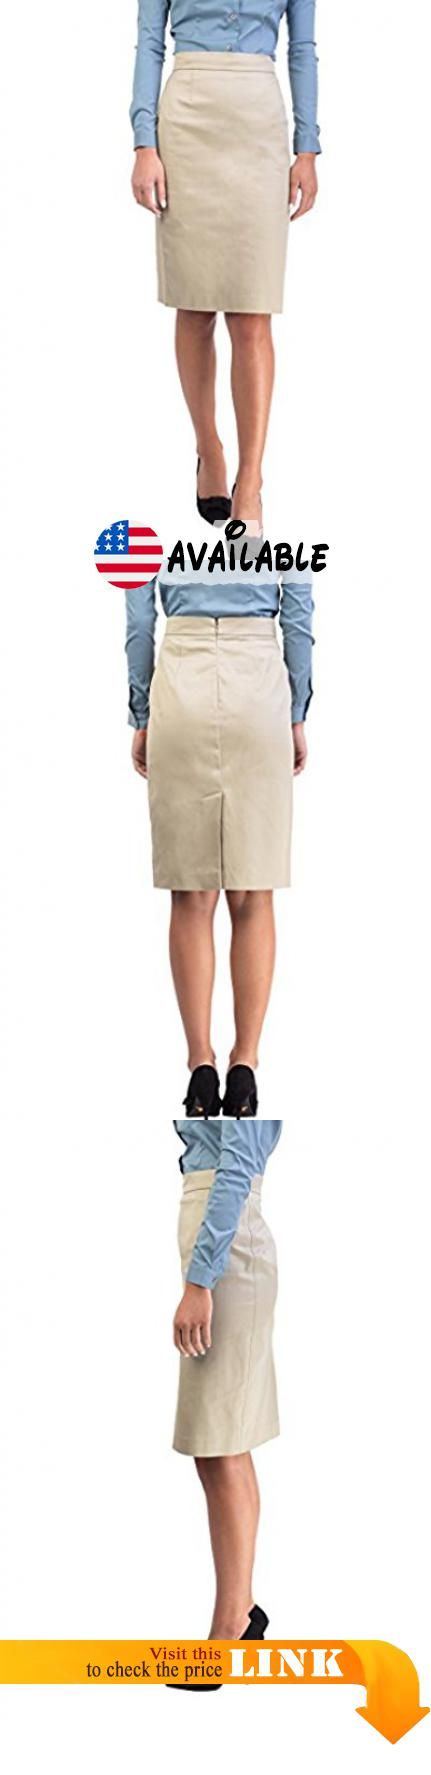 B072J32D45 : Prada Women's Cotton Skirt Khaki. Prada Superior Quality and Design. Back zipper closure. Back slit. 98% Cotton 2% Other fibers. Made in Romania #Apparel #SKIRT